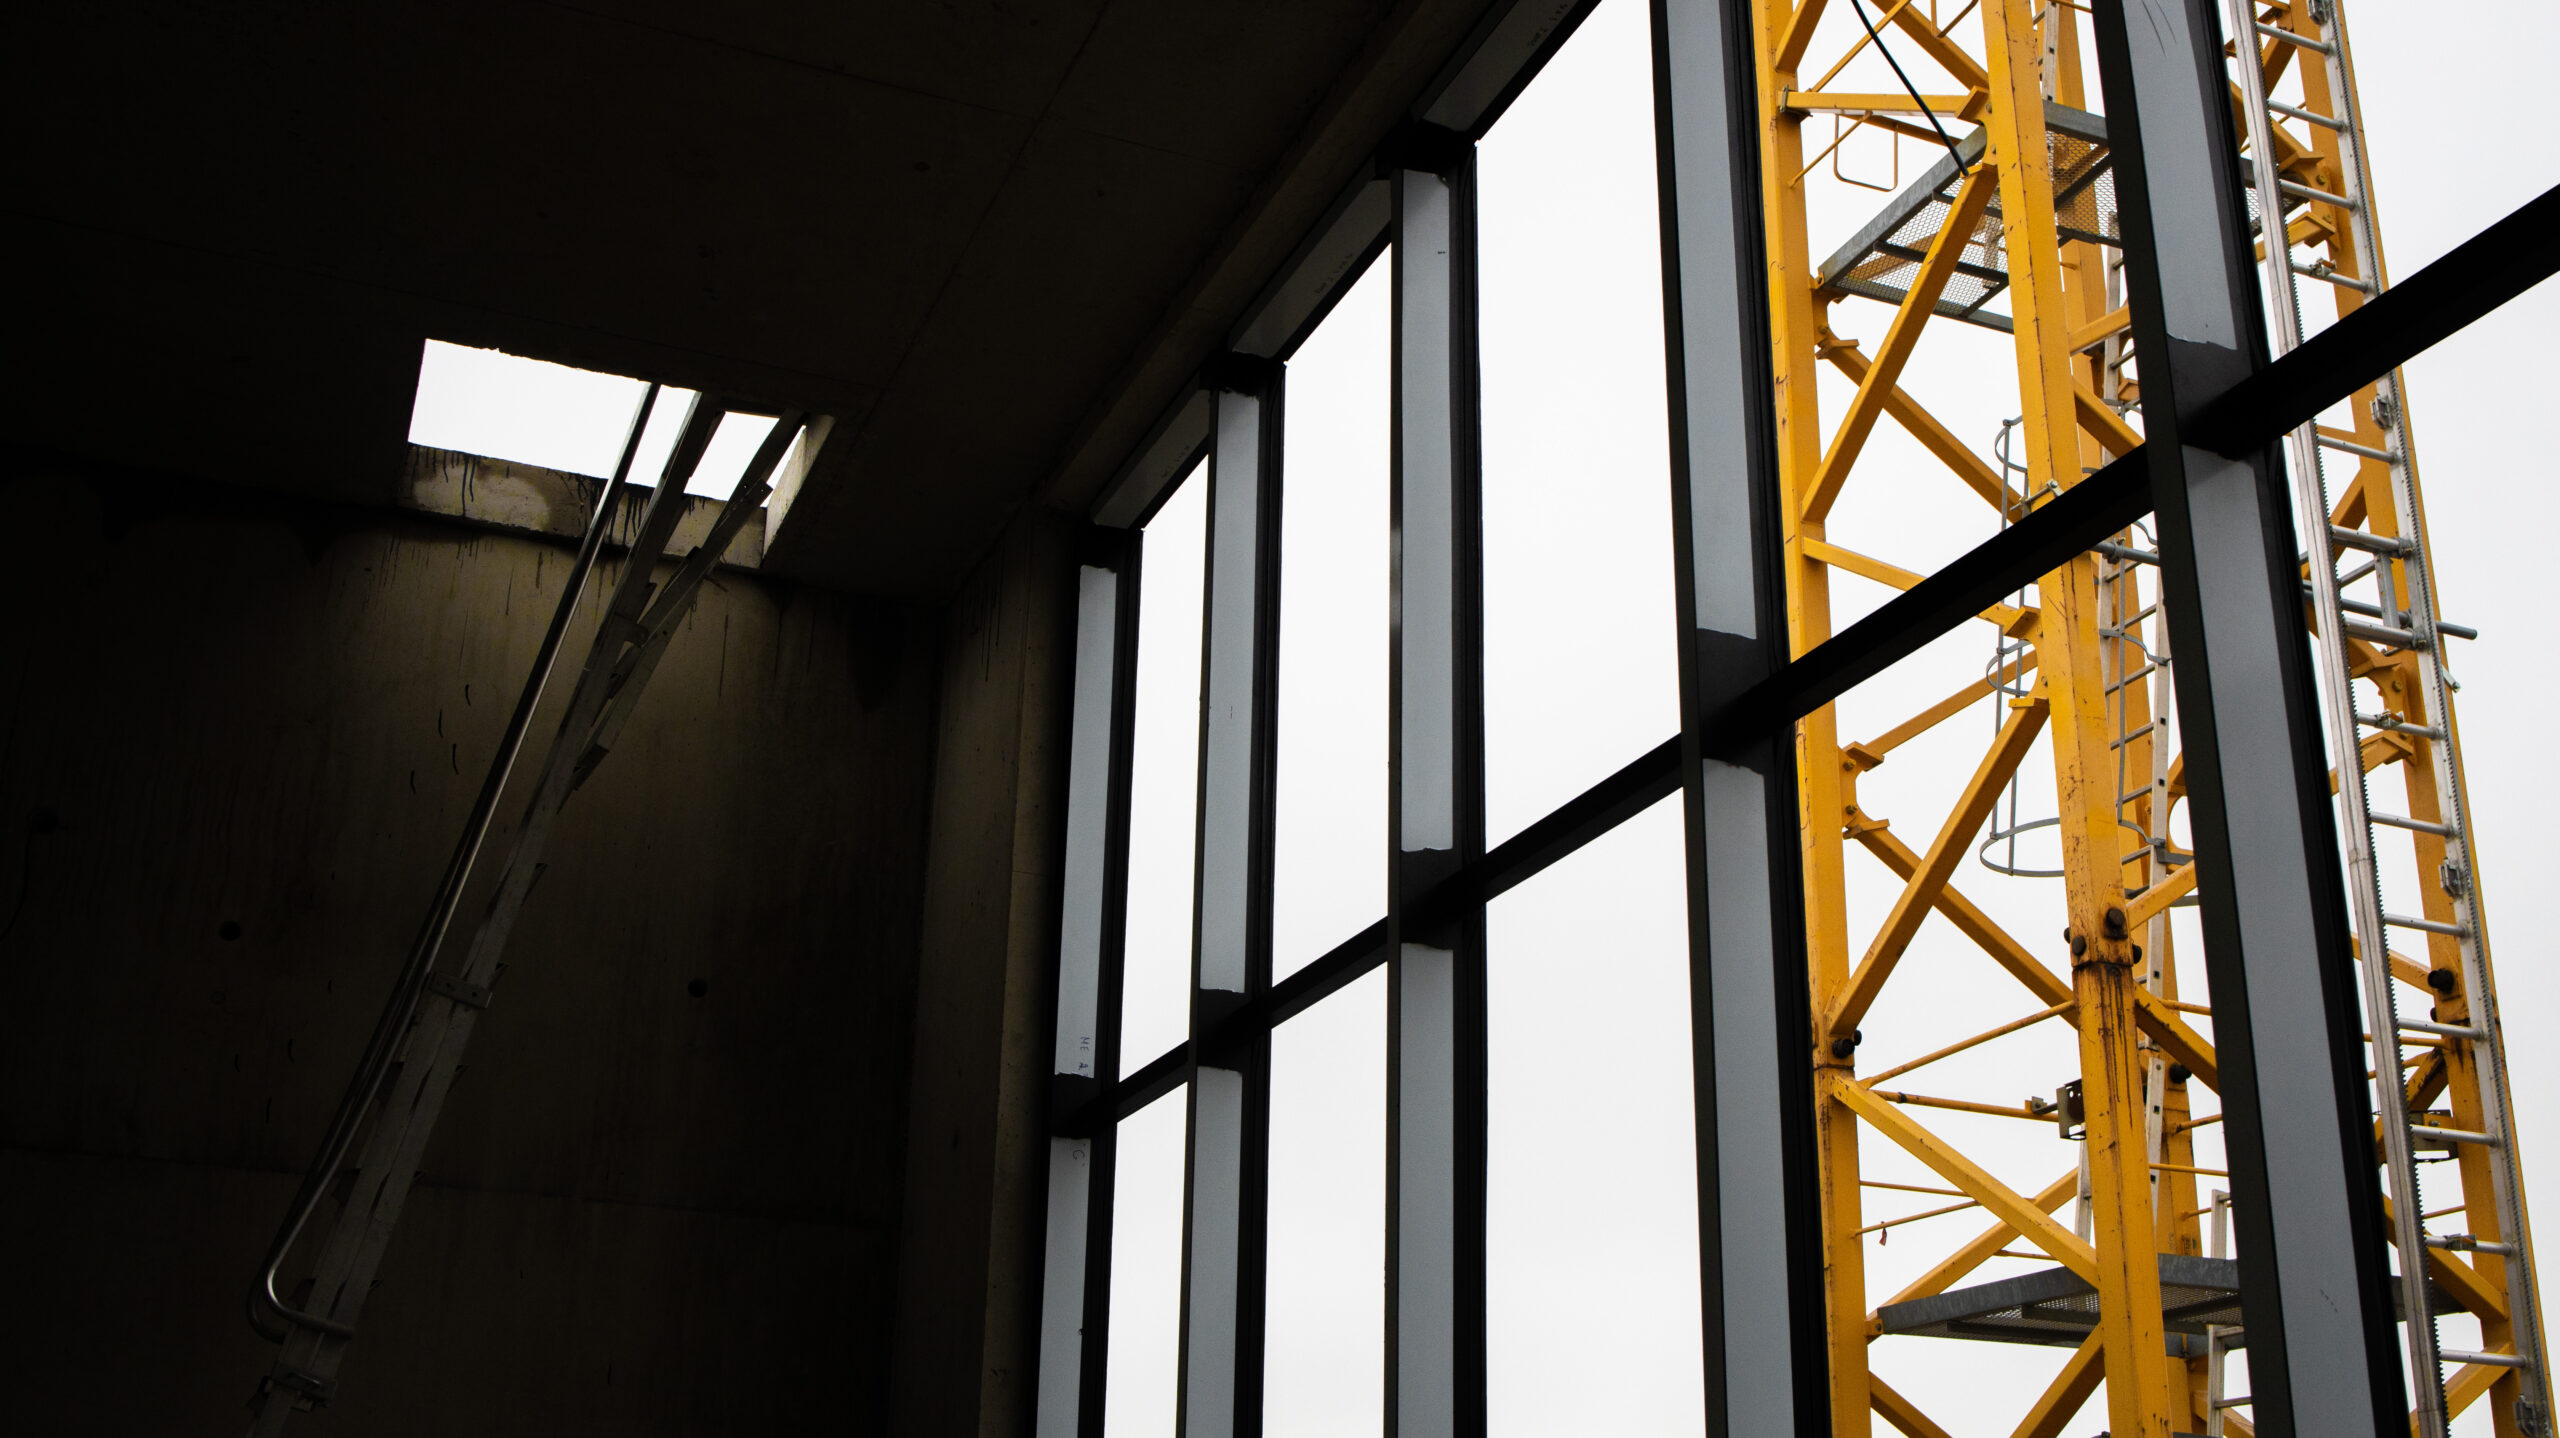 chantier-vitry-groupe-city